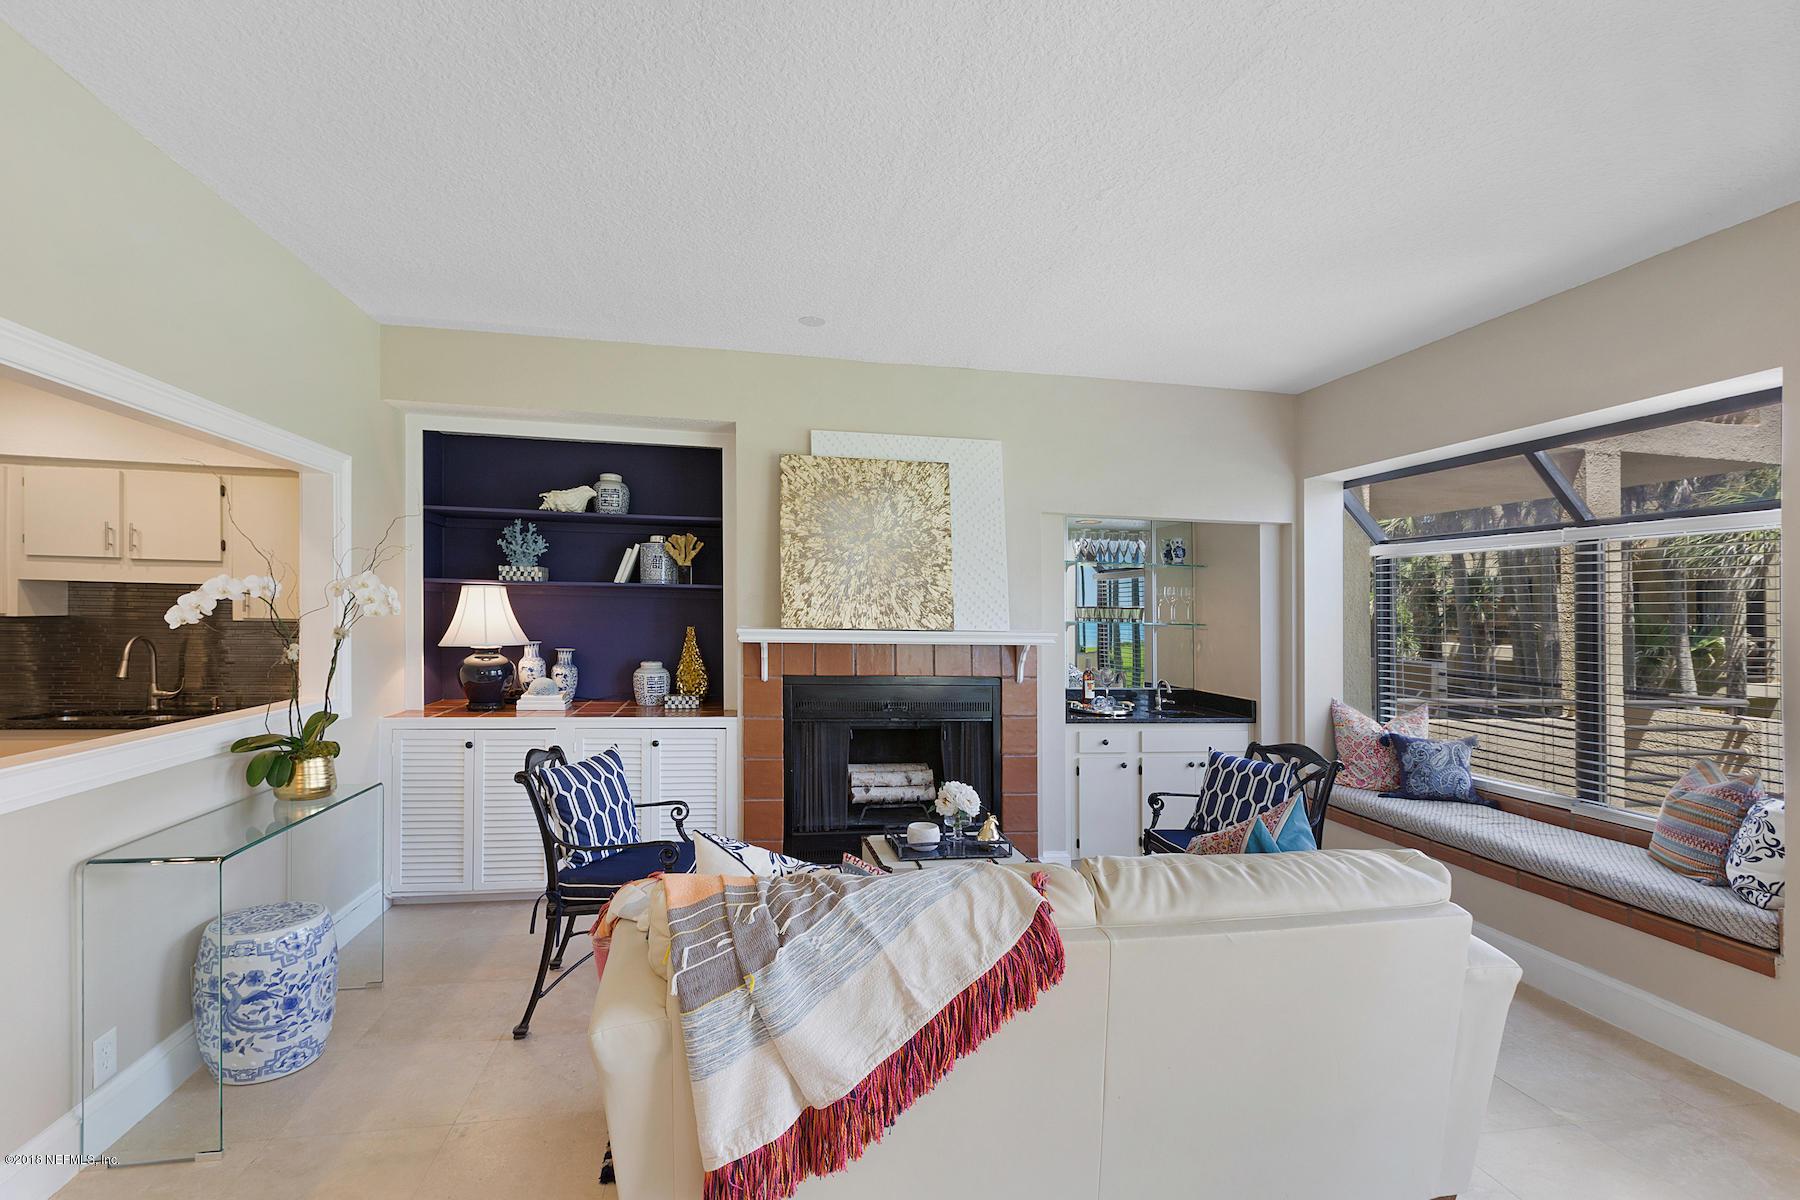 725 SPINNAKERS REACH, PONTE VEDRA BEACH, FLORIDA 32082, 1 Bedroom Bedrooms, ,2 BathroomsBathrooms,Residential - condos/townhomes,For sale,SPINNAKERS REACH,943112